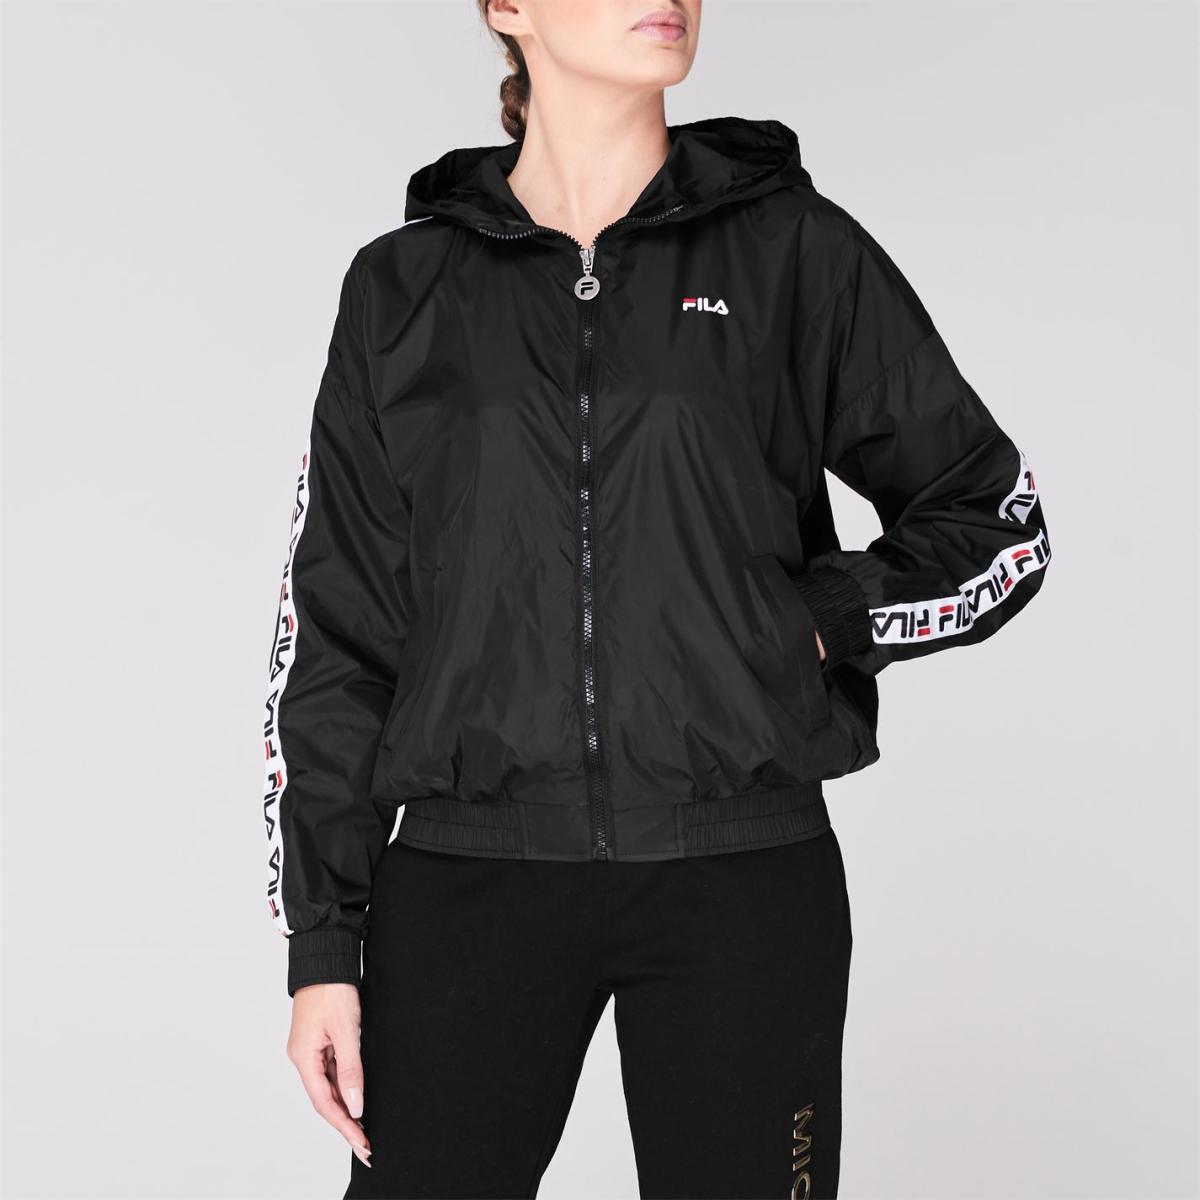 FILA Tilda Kapuzenjacke Jacke Kapuzenpullover Damen Sweatshirt Pullover 9332